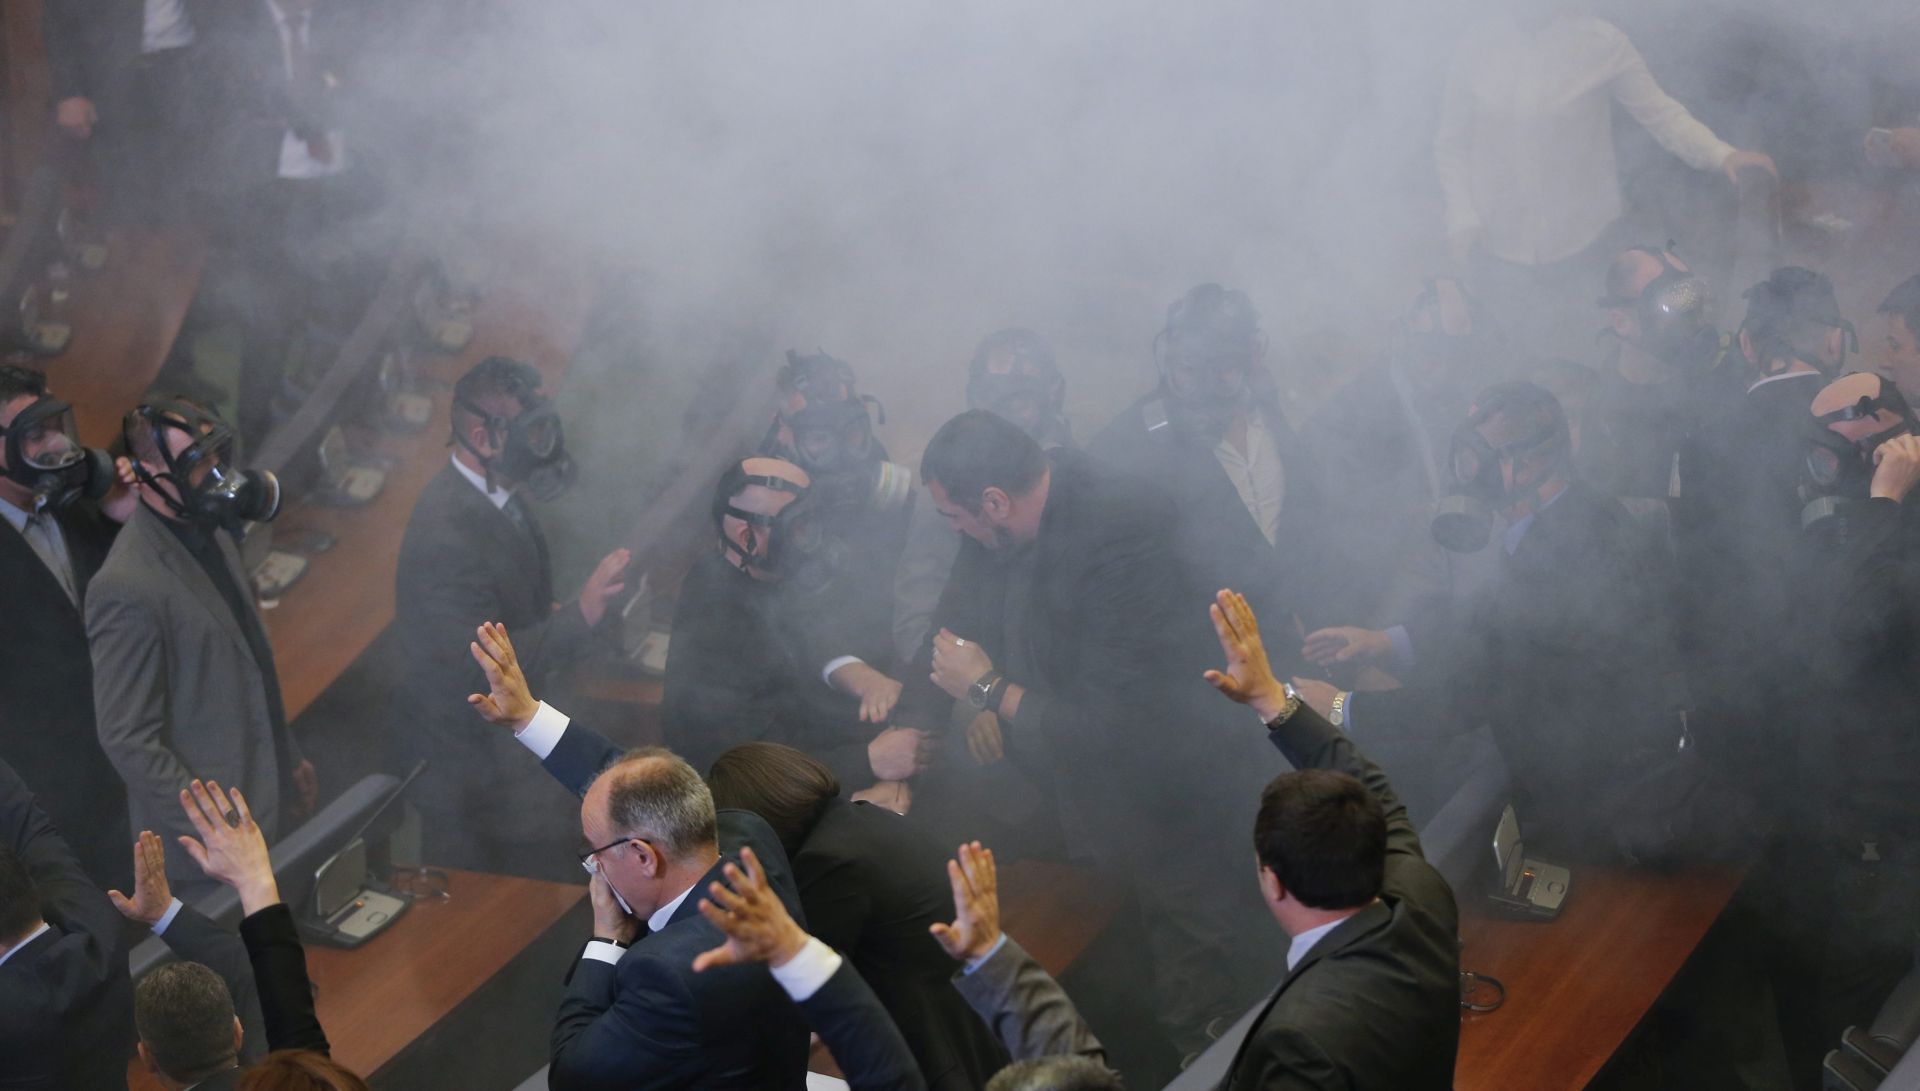 REAGIRALA POLICIJA: Kosovska oporba suzavcem prekinula prvo zasjedanje parlamenta